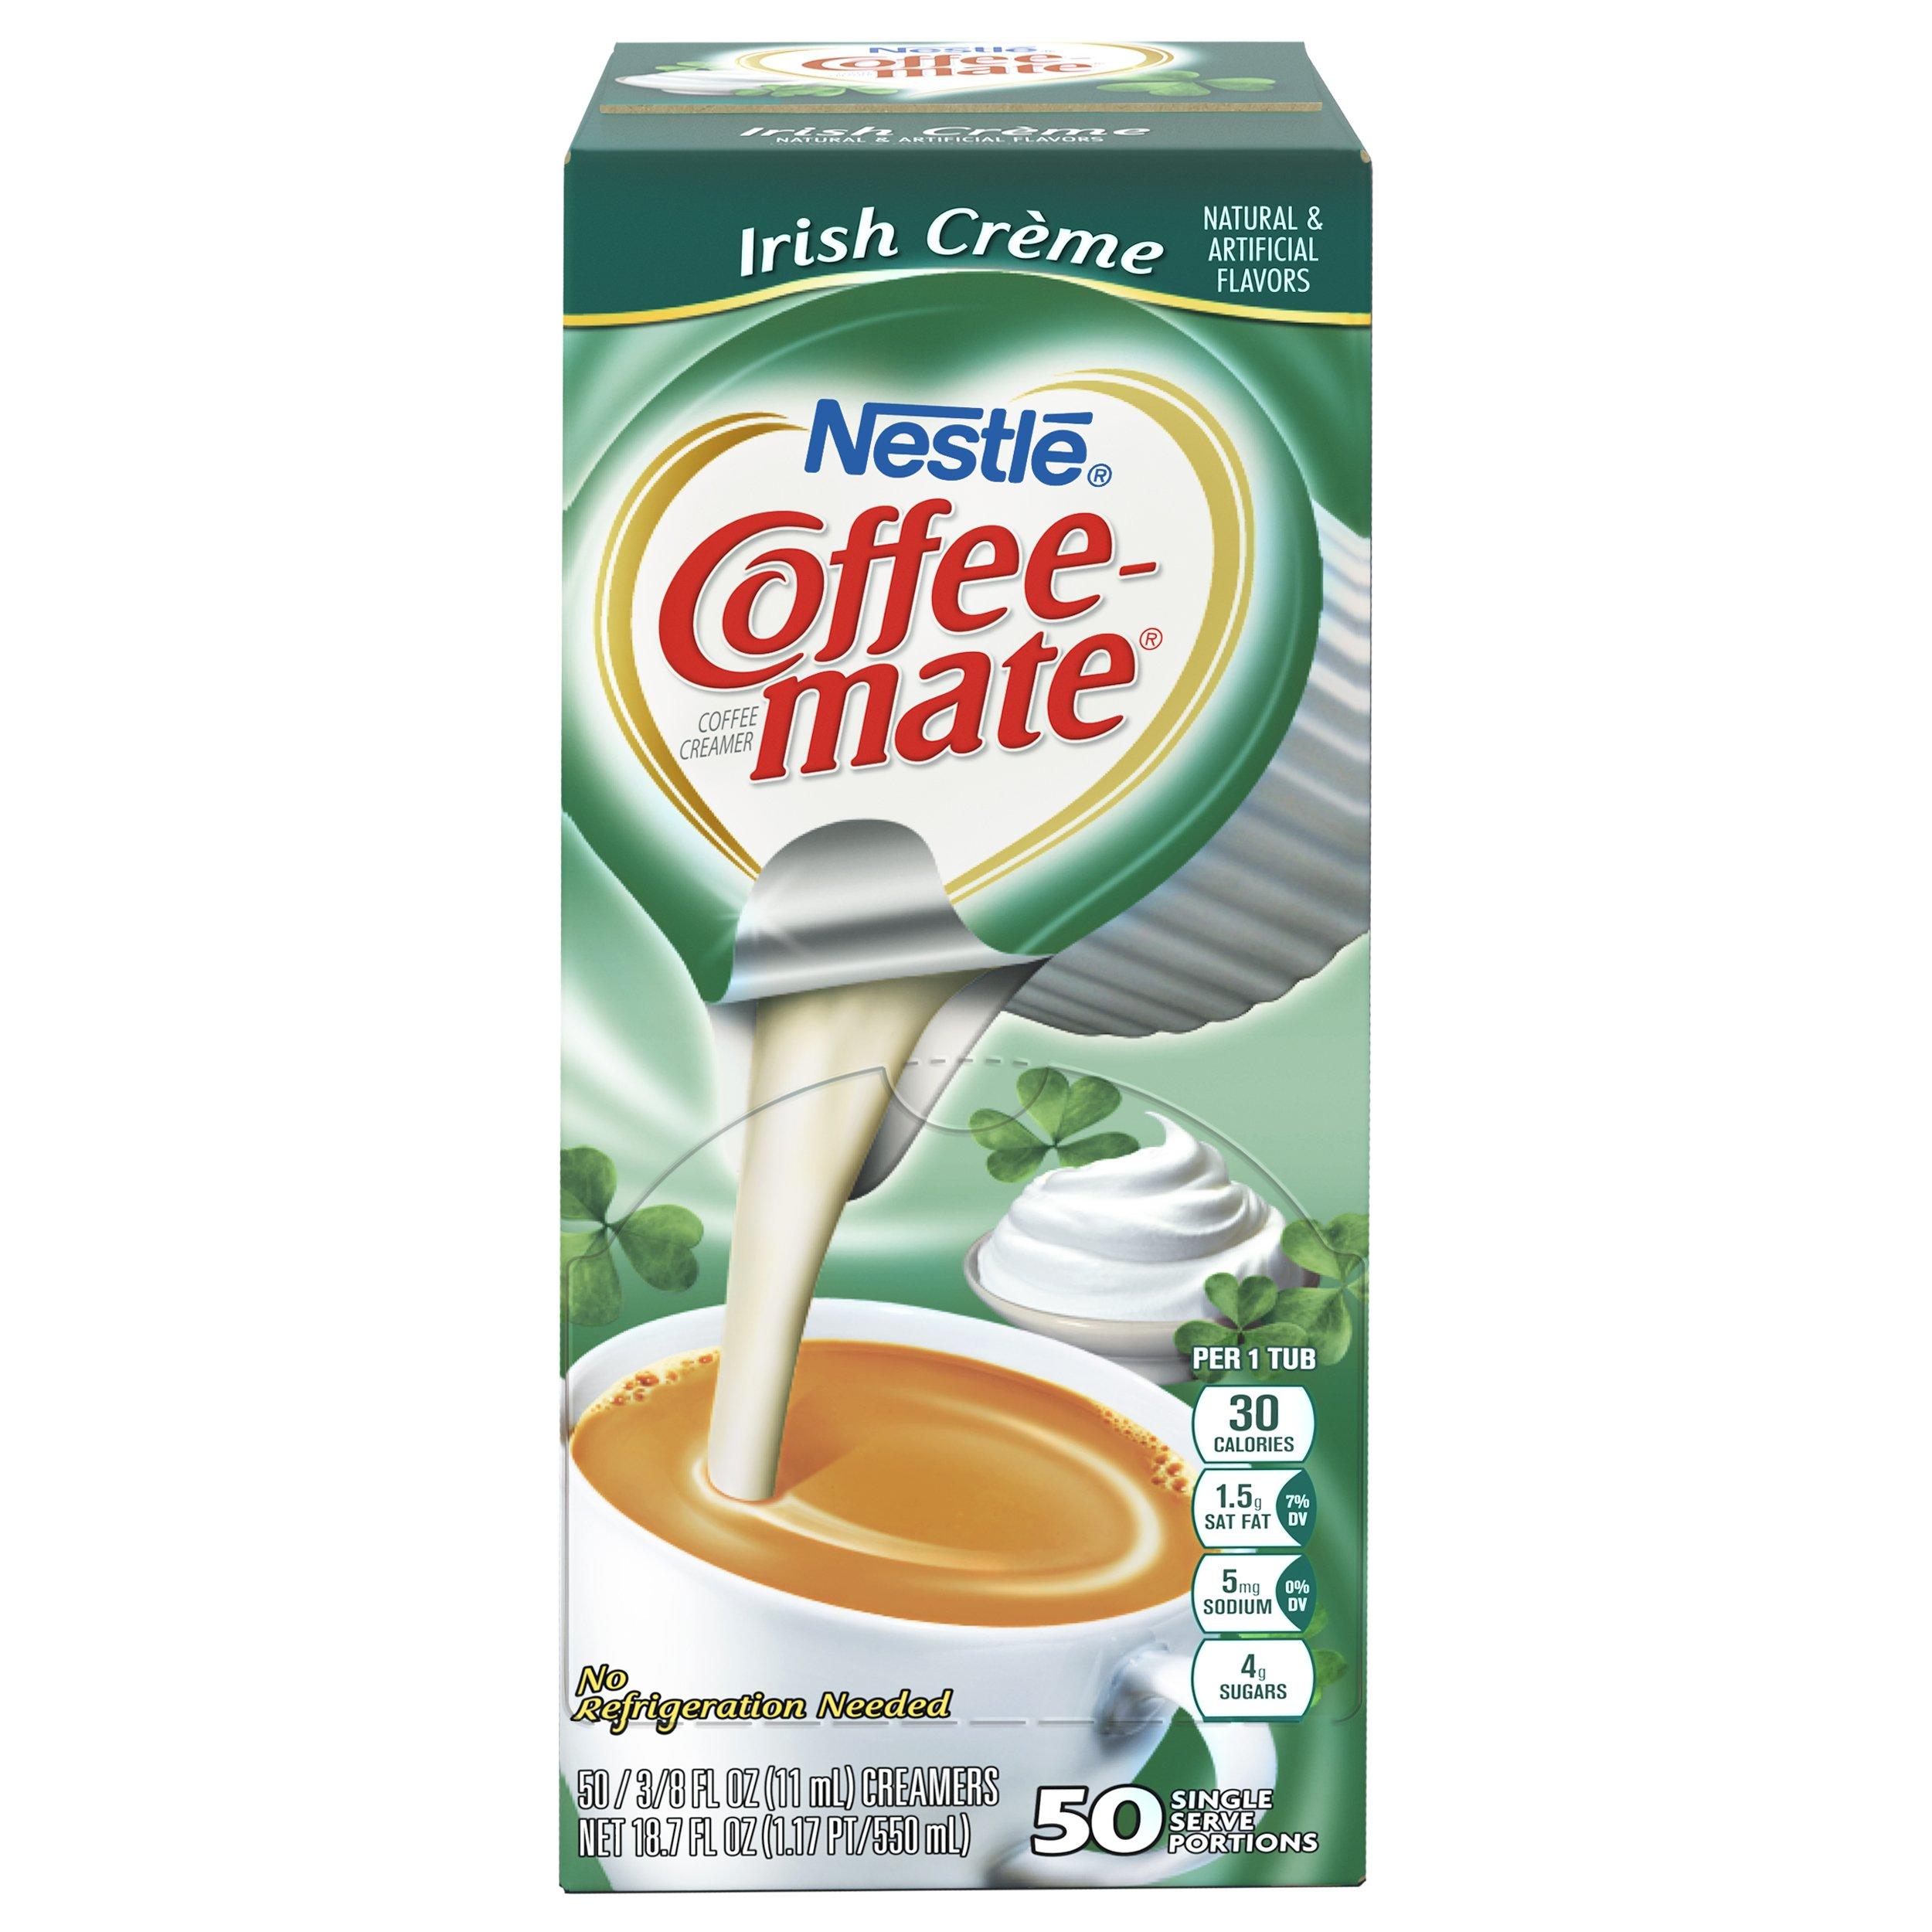 NESTLE COFFEE-MATE Coffee Creamer, Irish Creme, liquid creamer singles, 50 Count (Pack of 4) by Nestle Coffee Mate (Image #2)